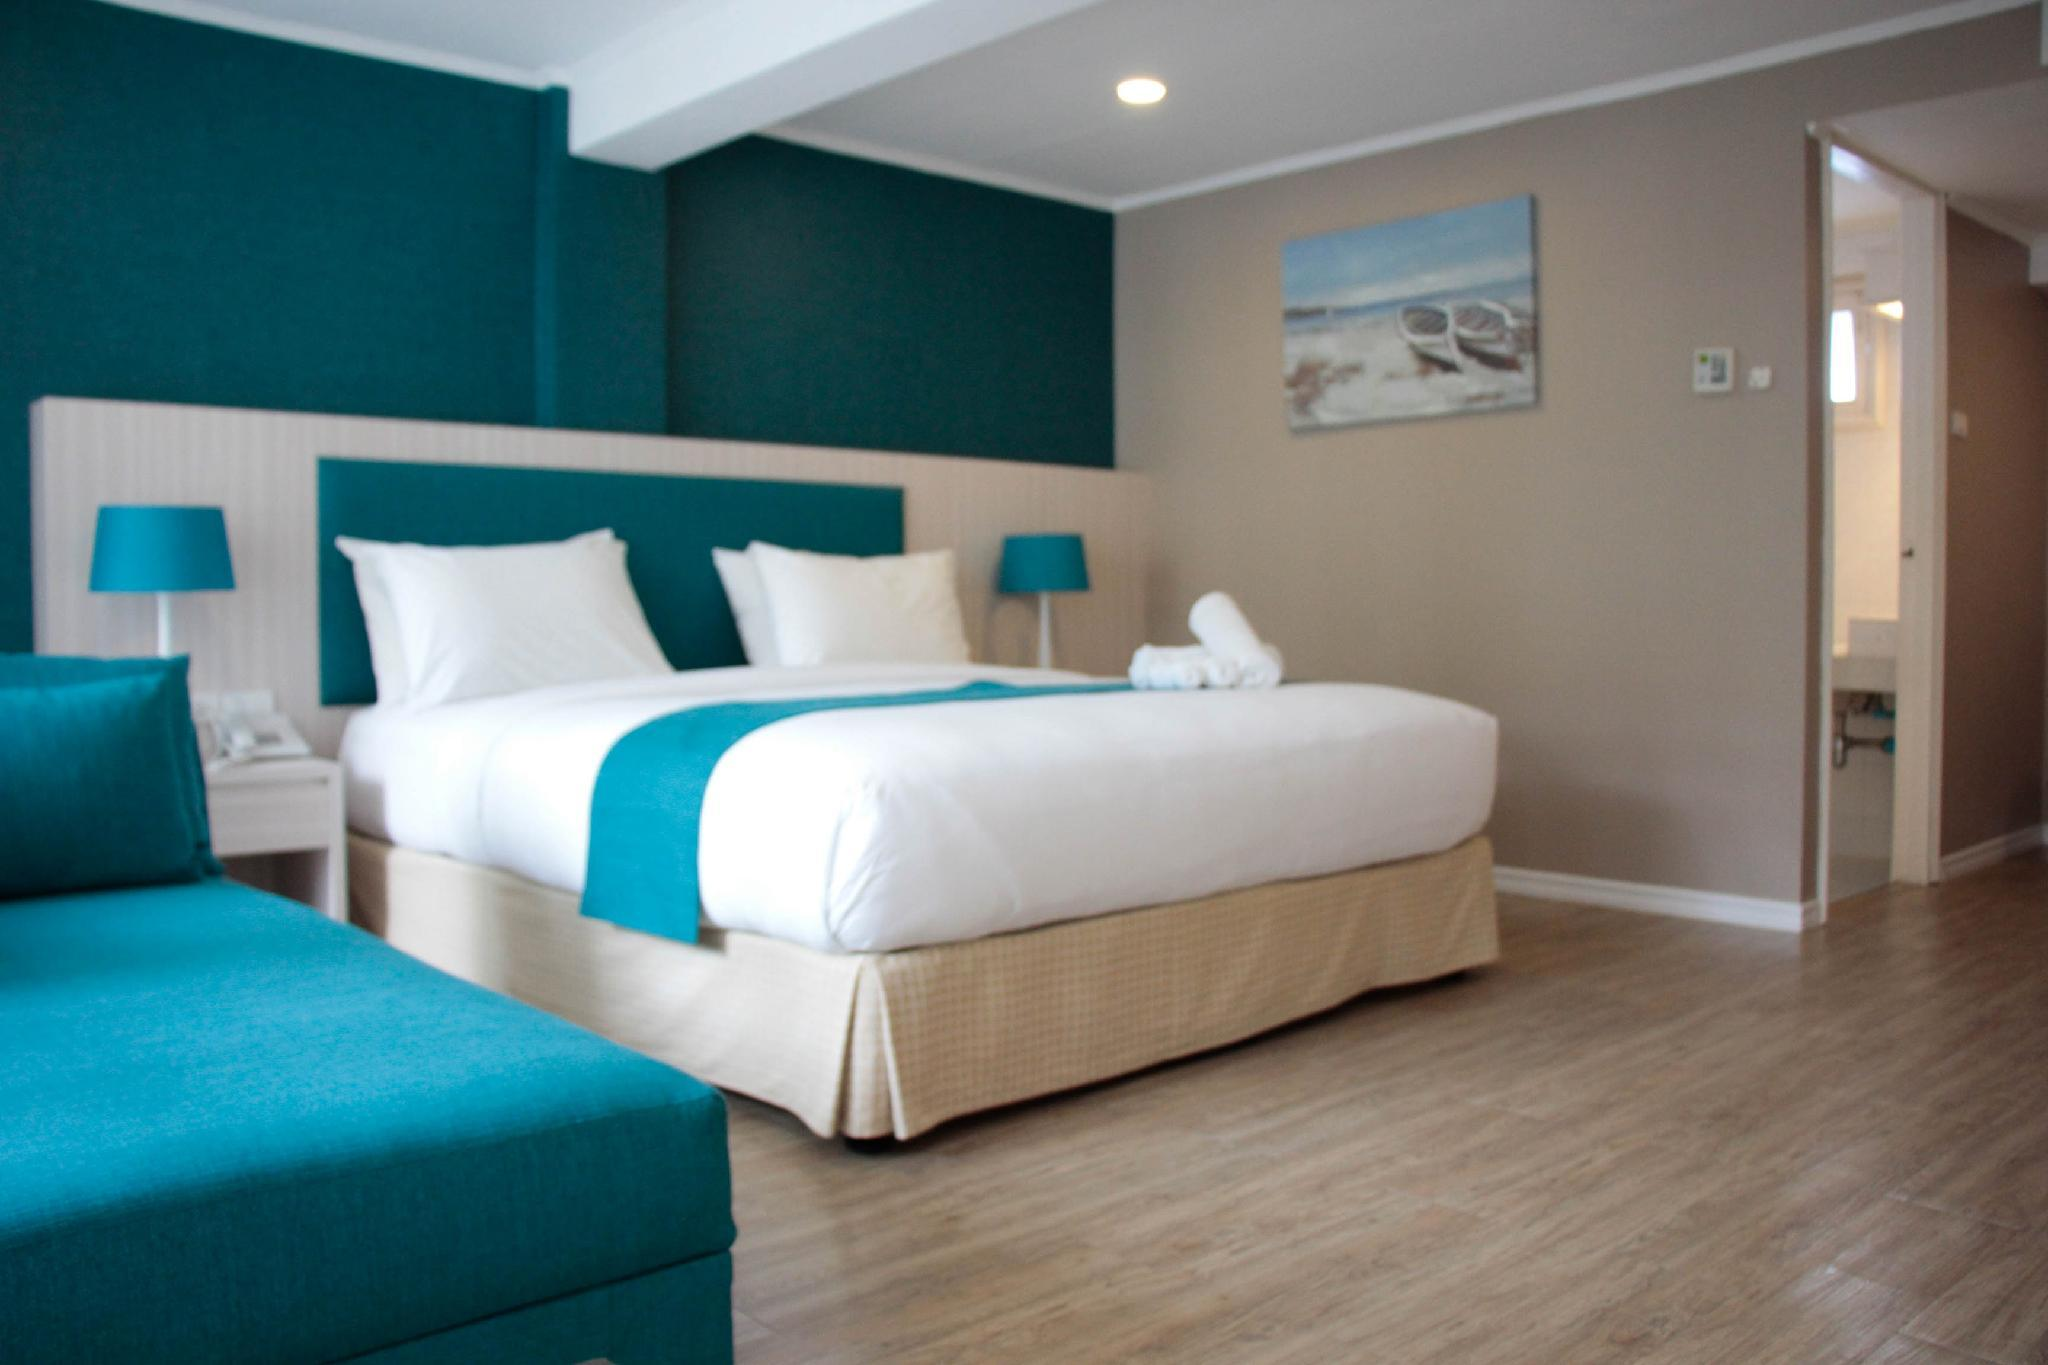 Book Villa Atchara Hotel (Phuket) - 2019 PRICES FROM A$54!